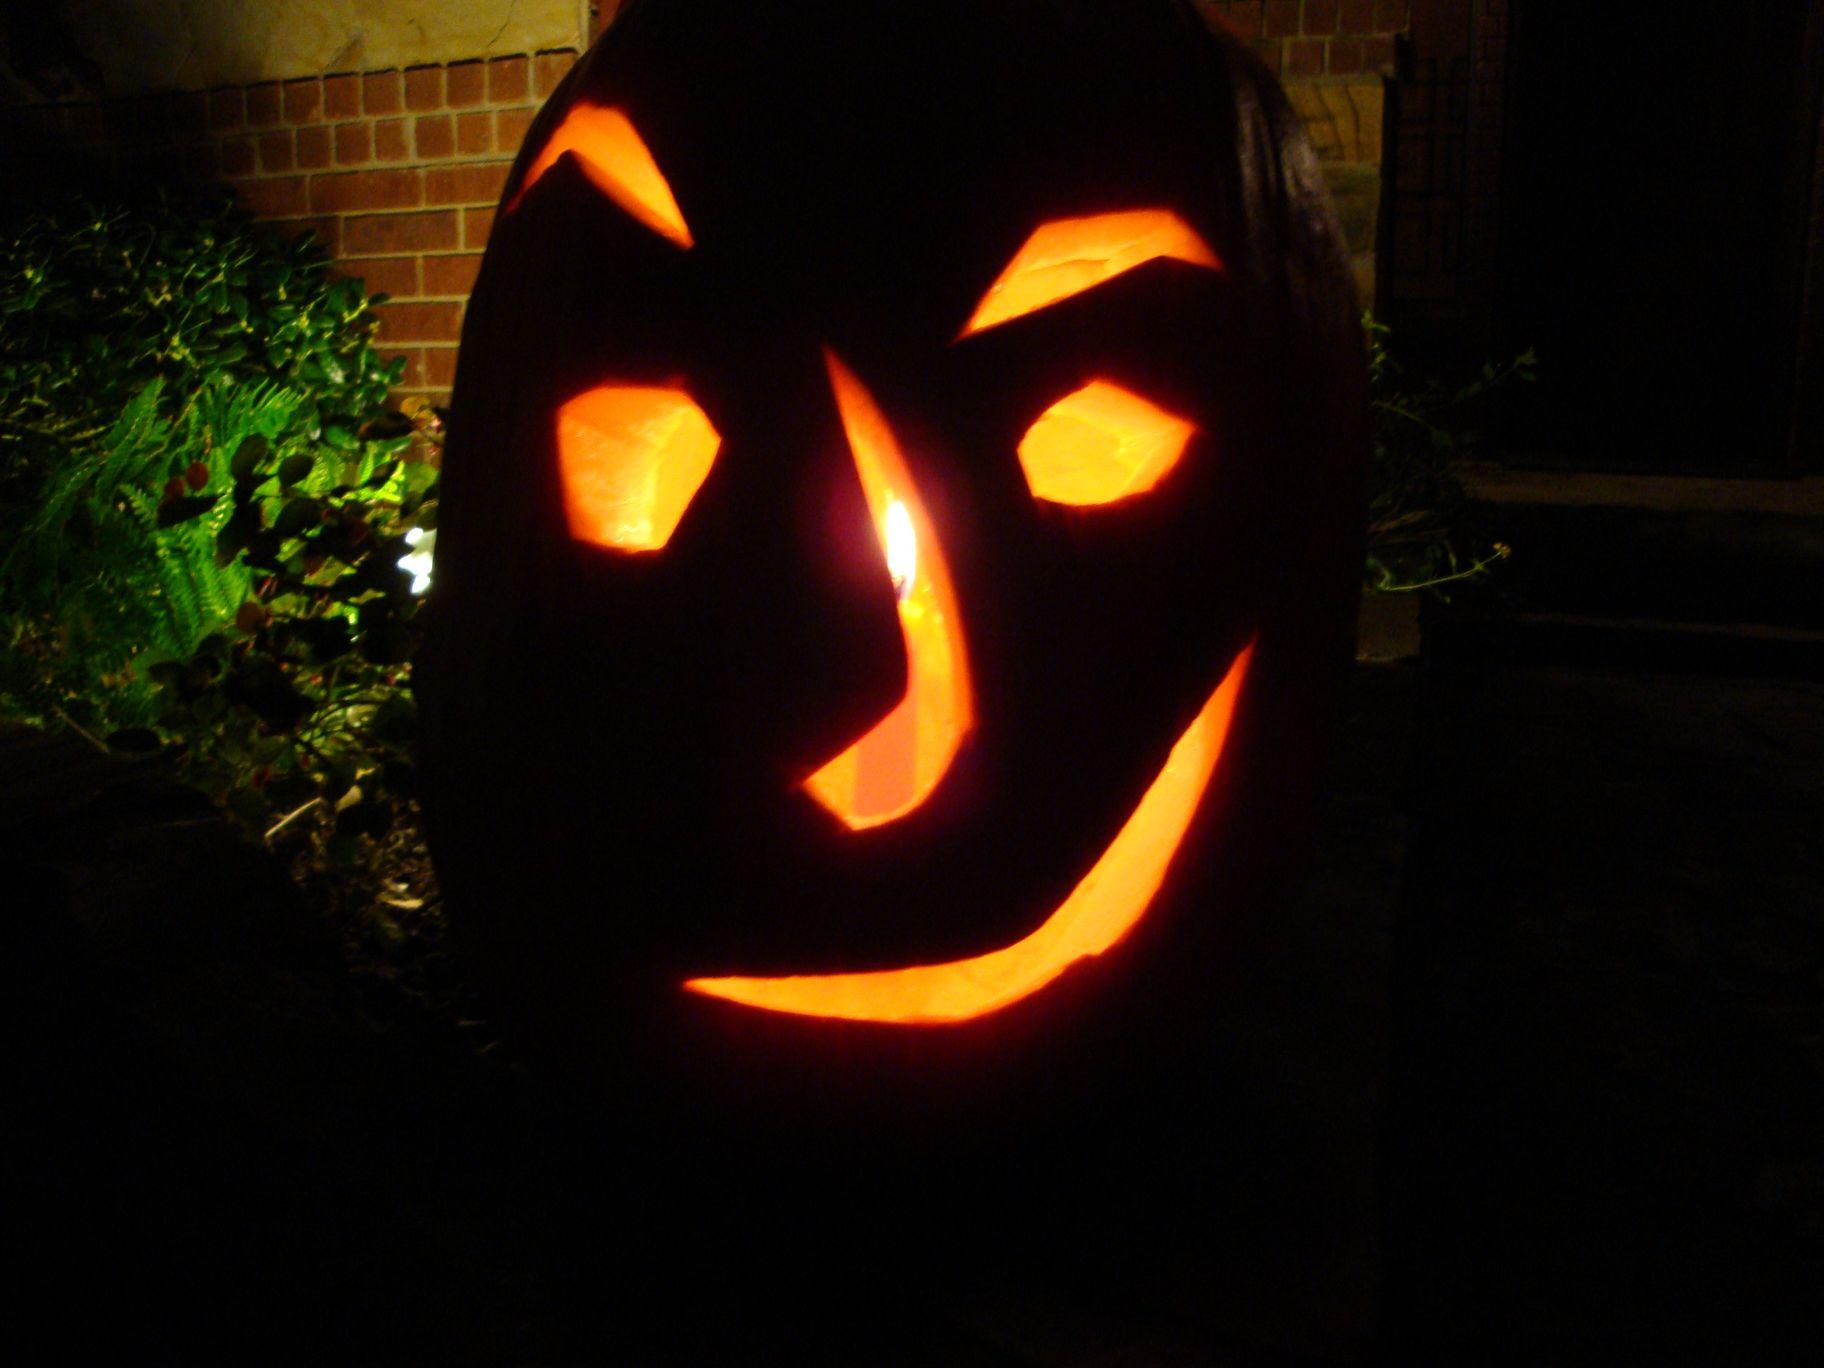 Halloween Carved Pumpkin 2009 [50%]